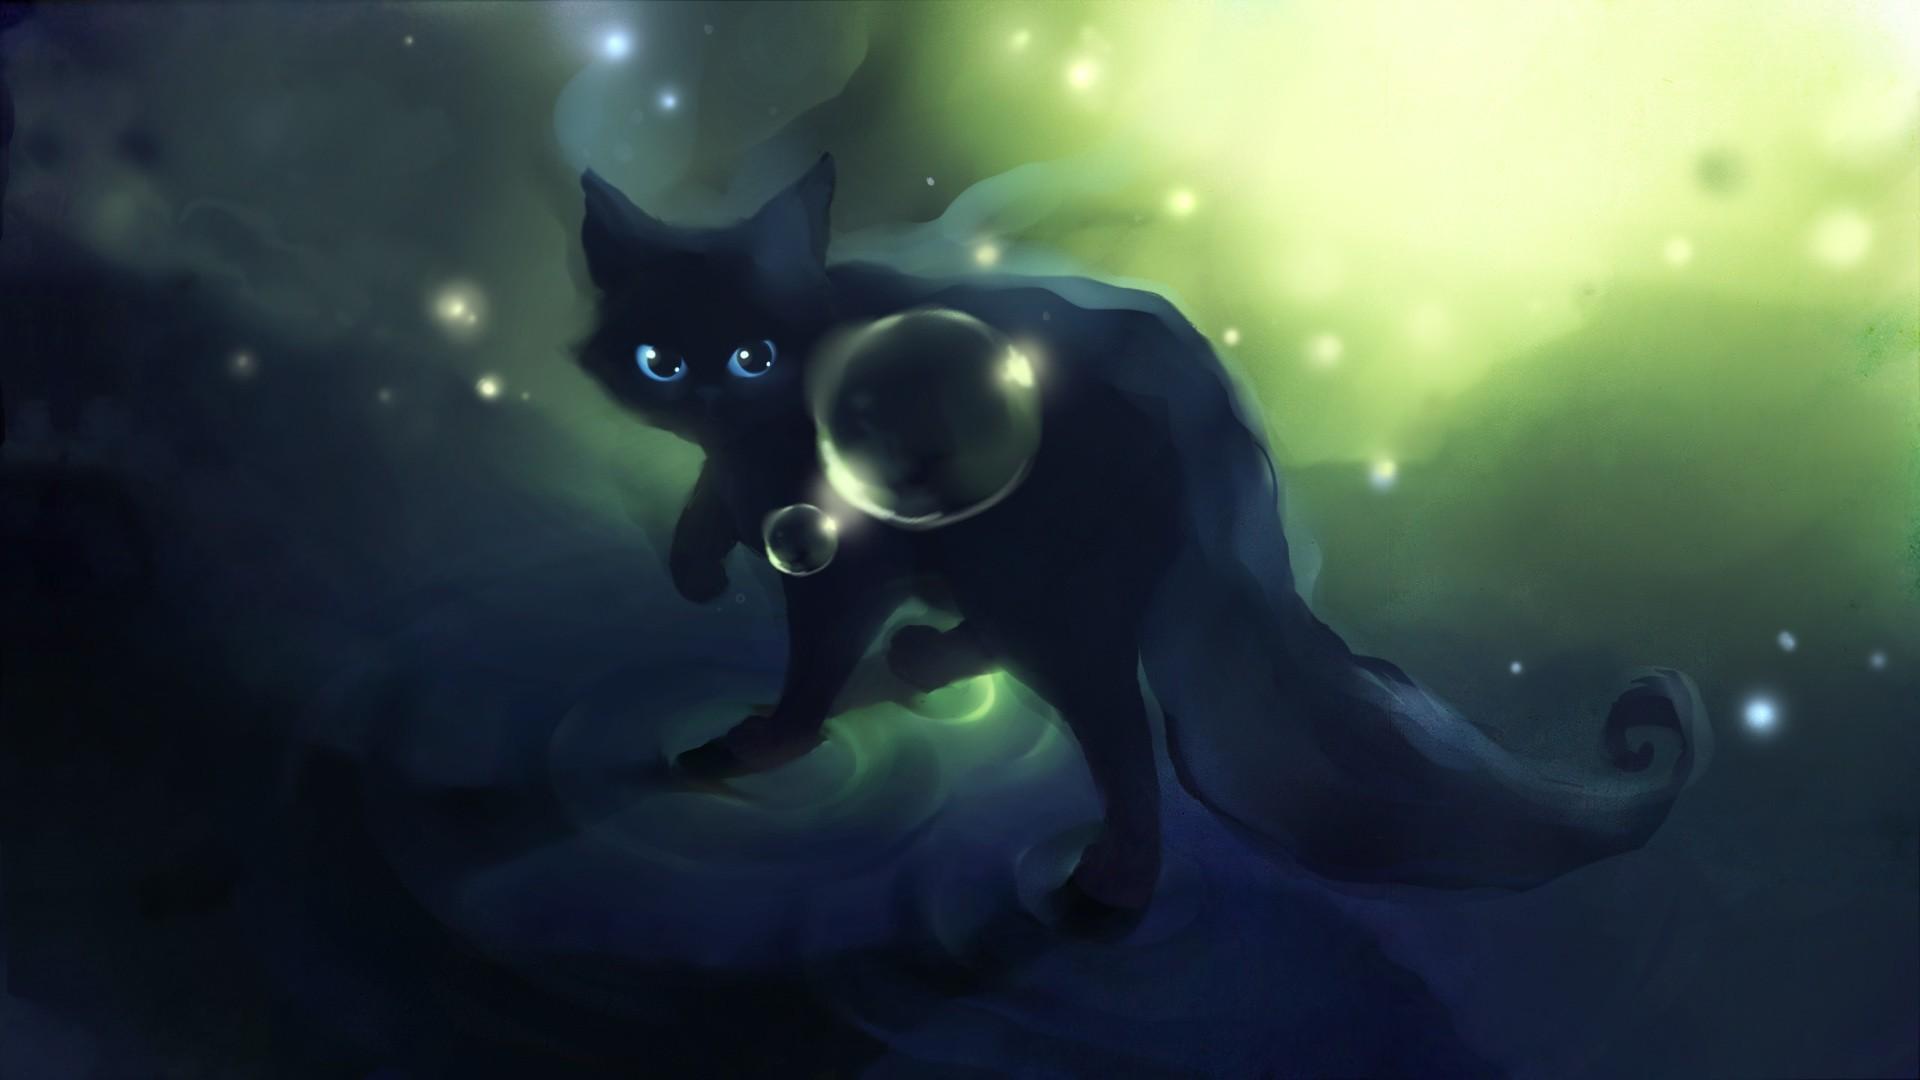 Res: 1920x1080, Anime Black Cat Wallpaper .